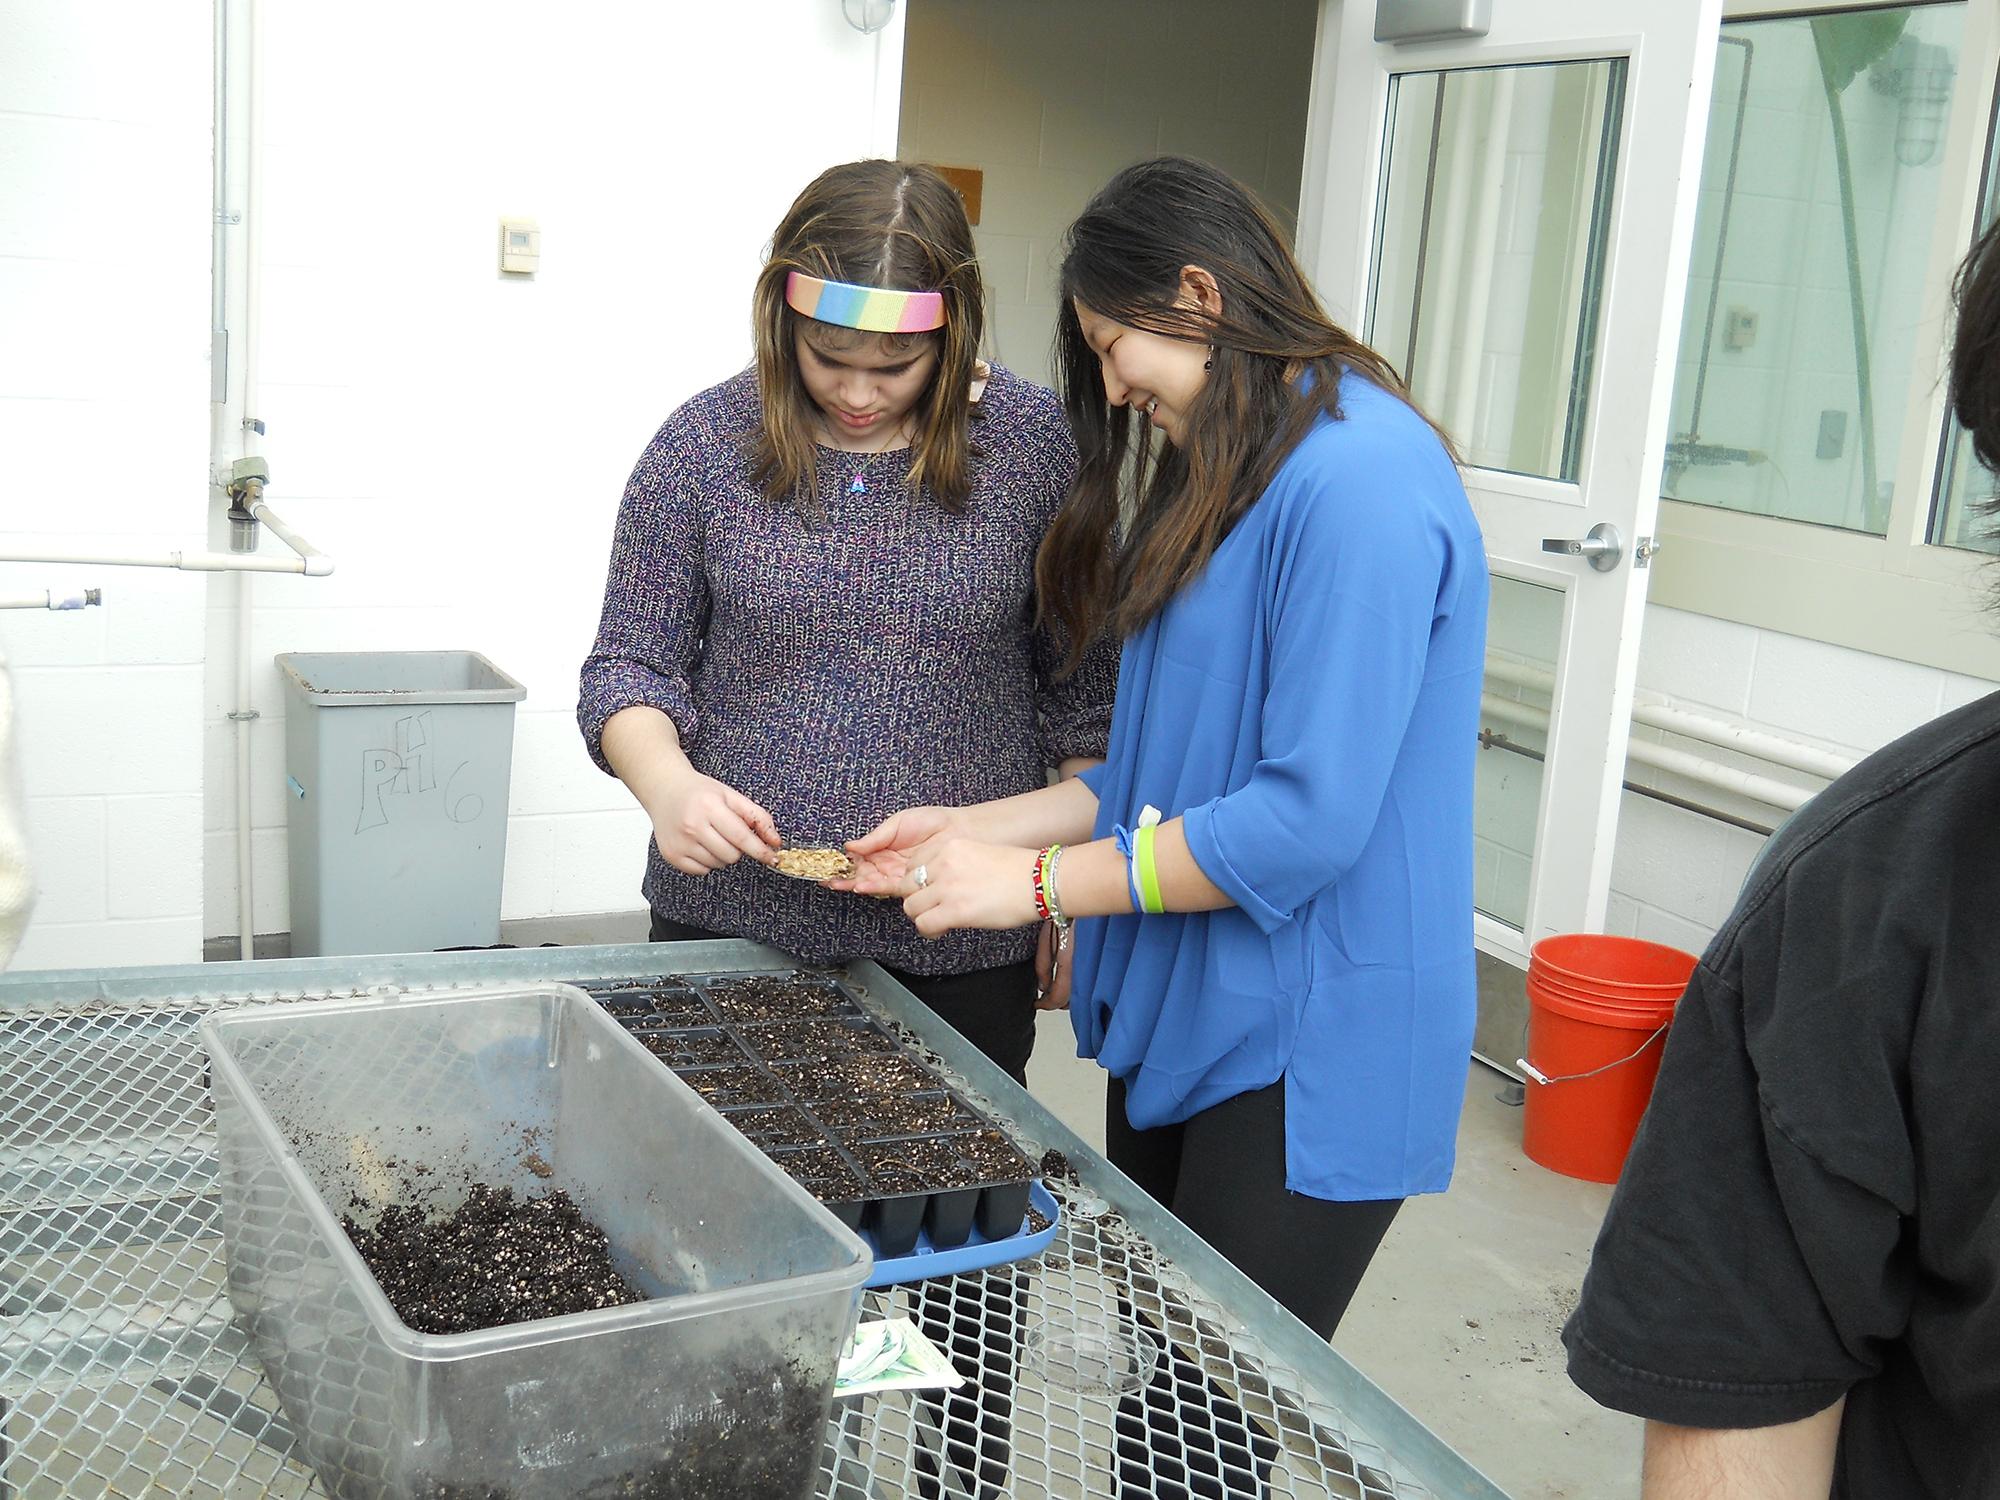 COOP Service Intern Kara Pintye-Everett '17, right, helps New Hartford High School student Alyssa plant seeds in the greenhouse.